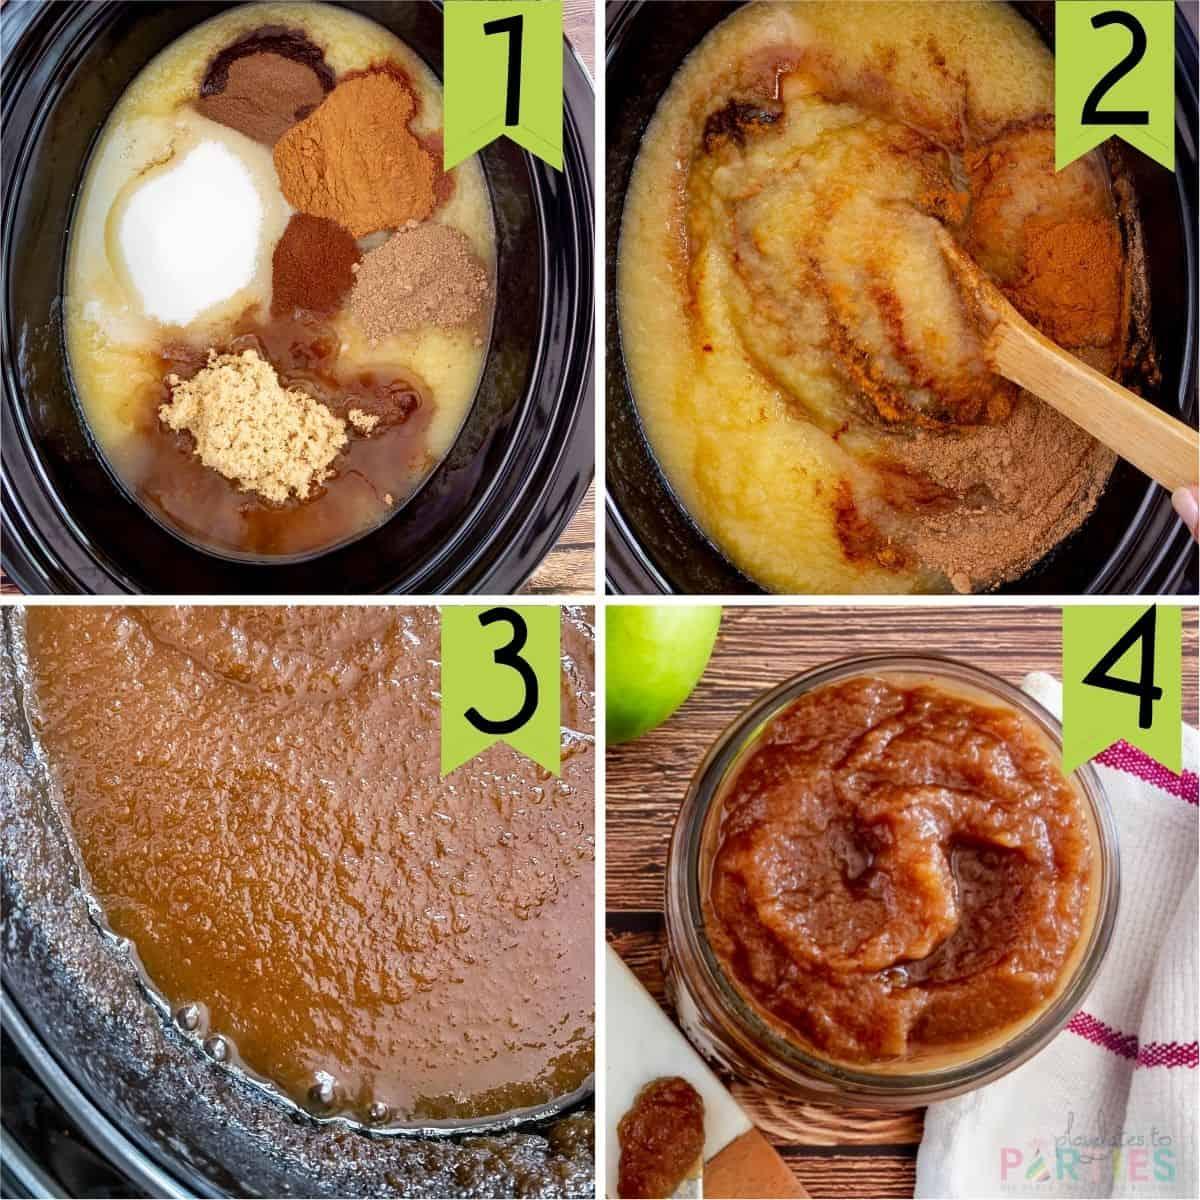 steps 1-4 for making easy apple butter in a crock pot